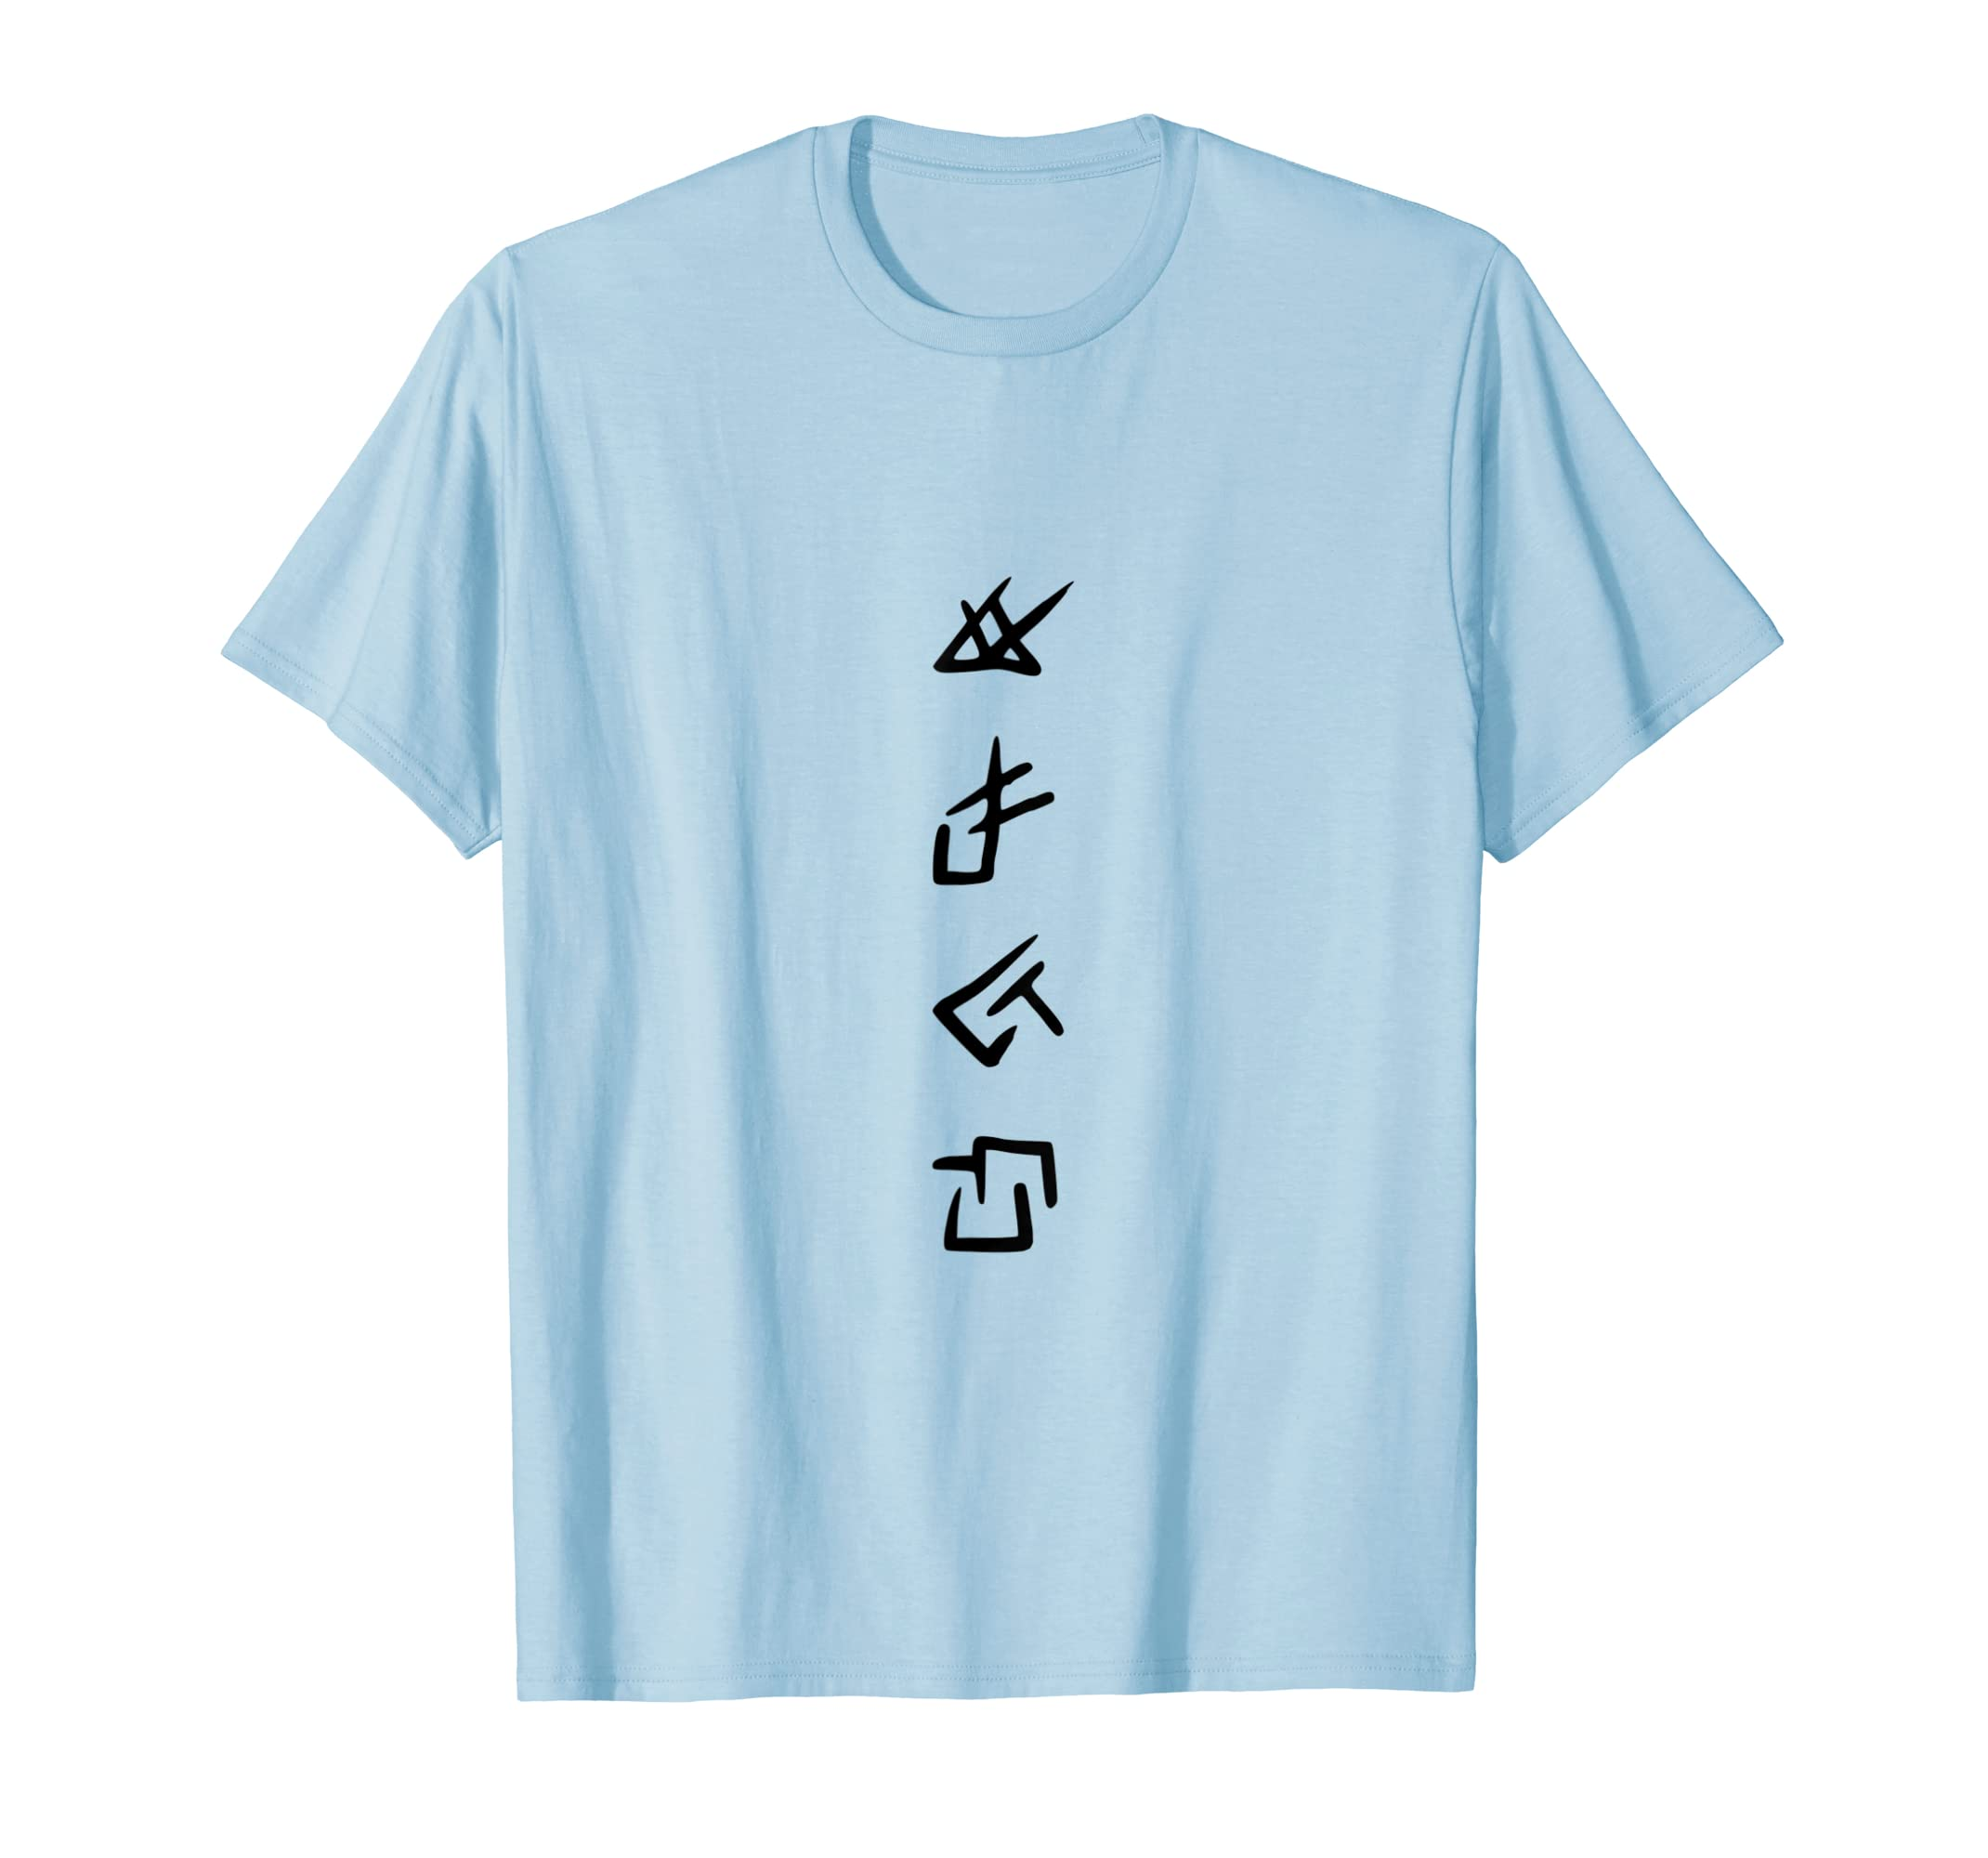 Amazon.com: new T-shirt ninja only american 2018: Clothing